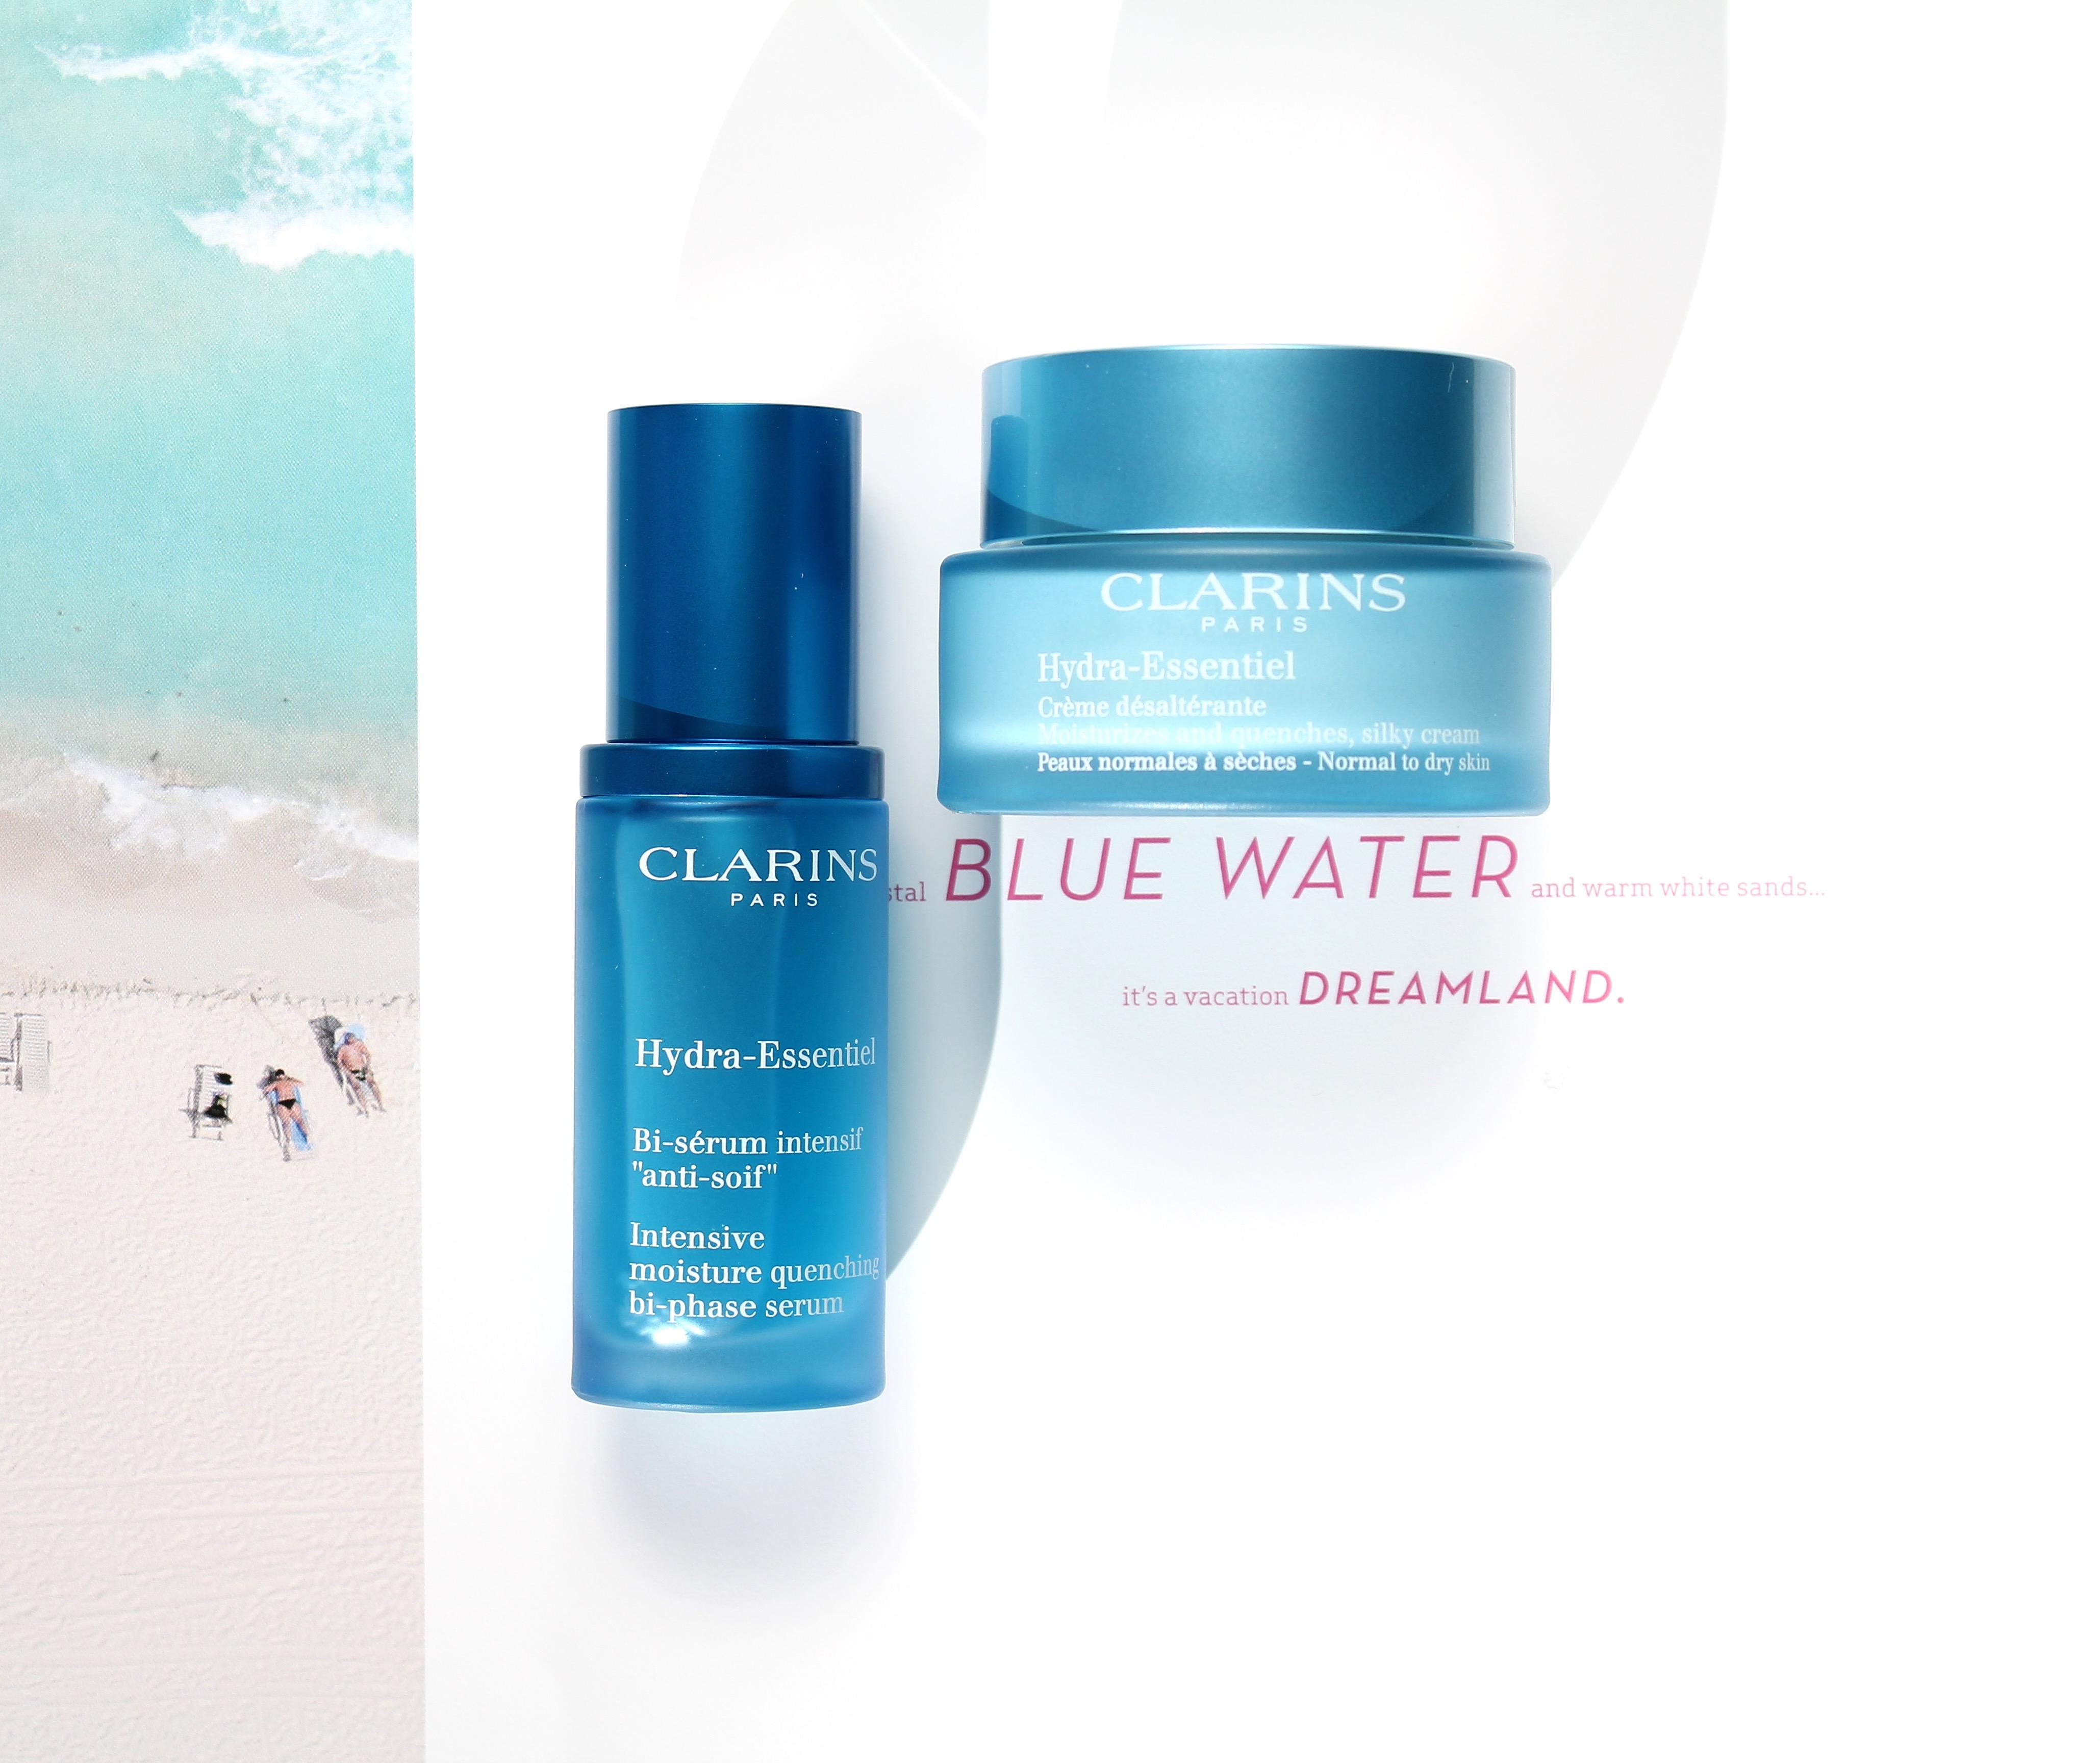 Hydra-Essentiel Rich Cream - Very Dry Skin by Clarins #6